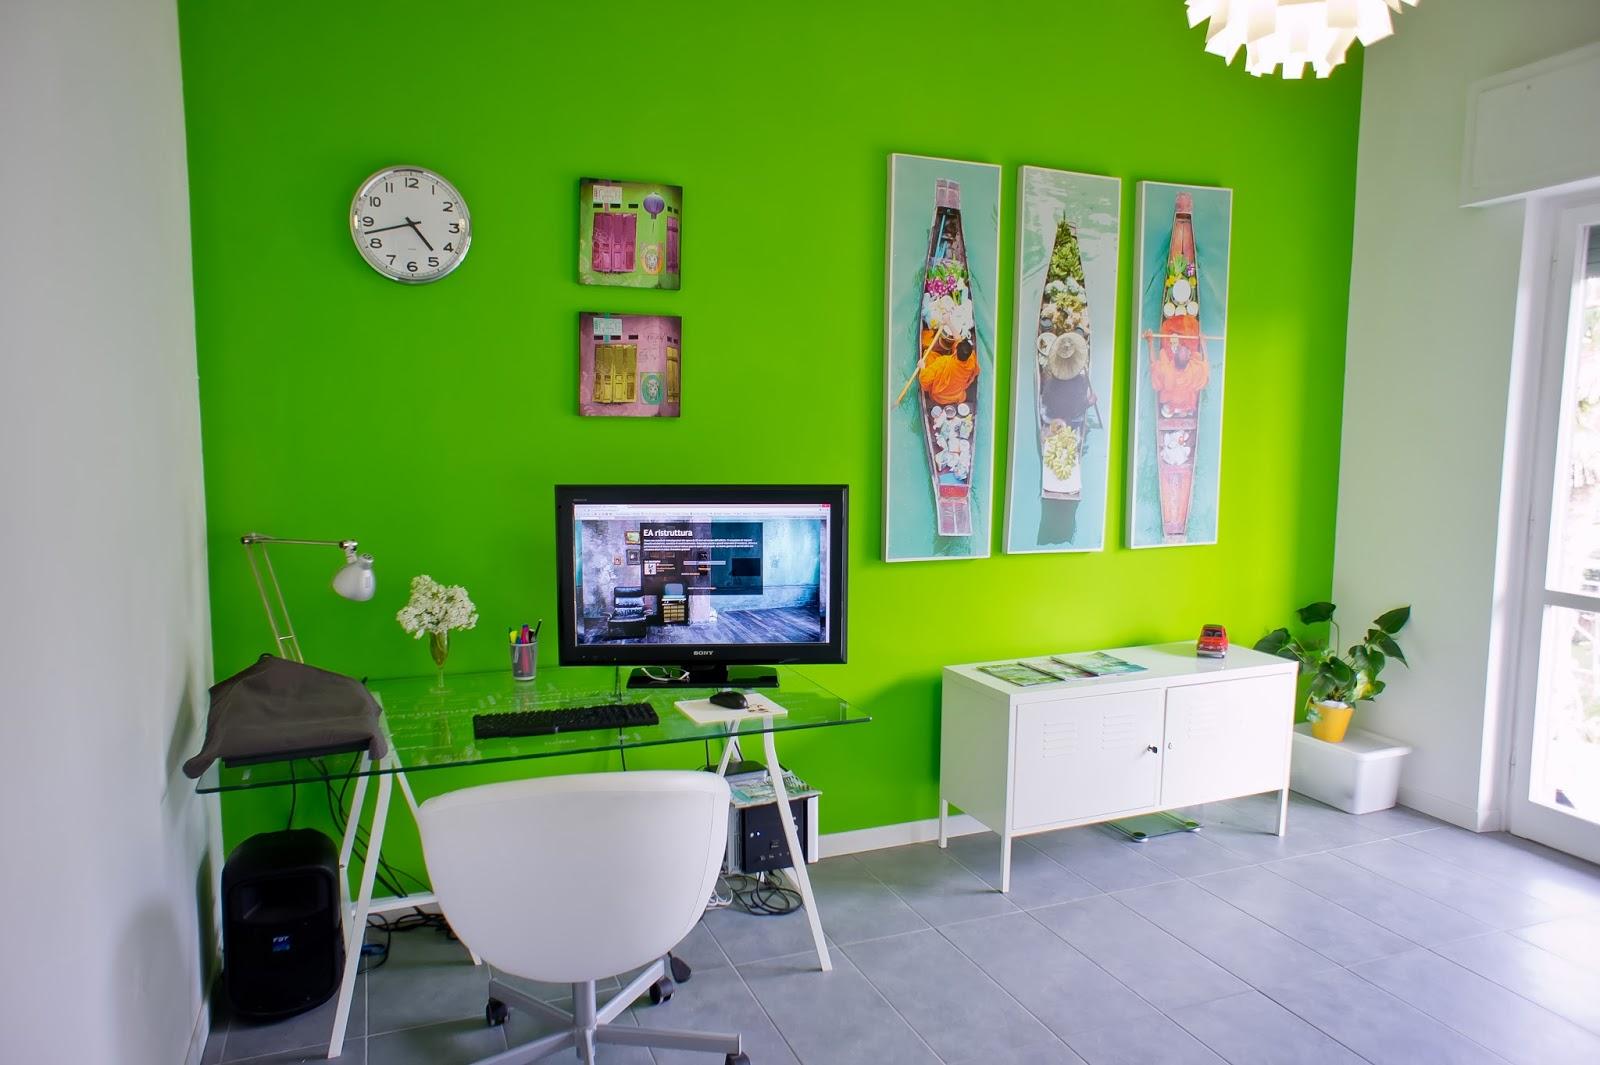 Camere Da Letto Verde Acido : Parete cucina verde acido parete rossa cucina trendy cucina bianca